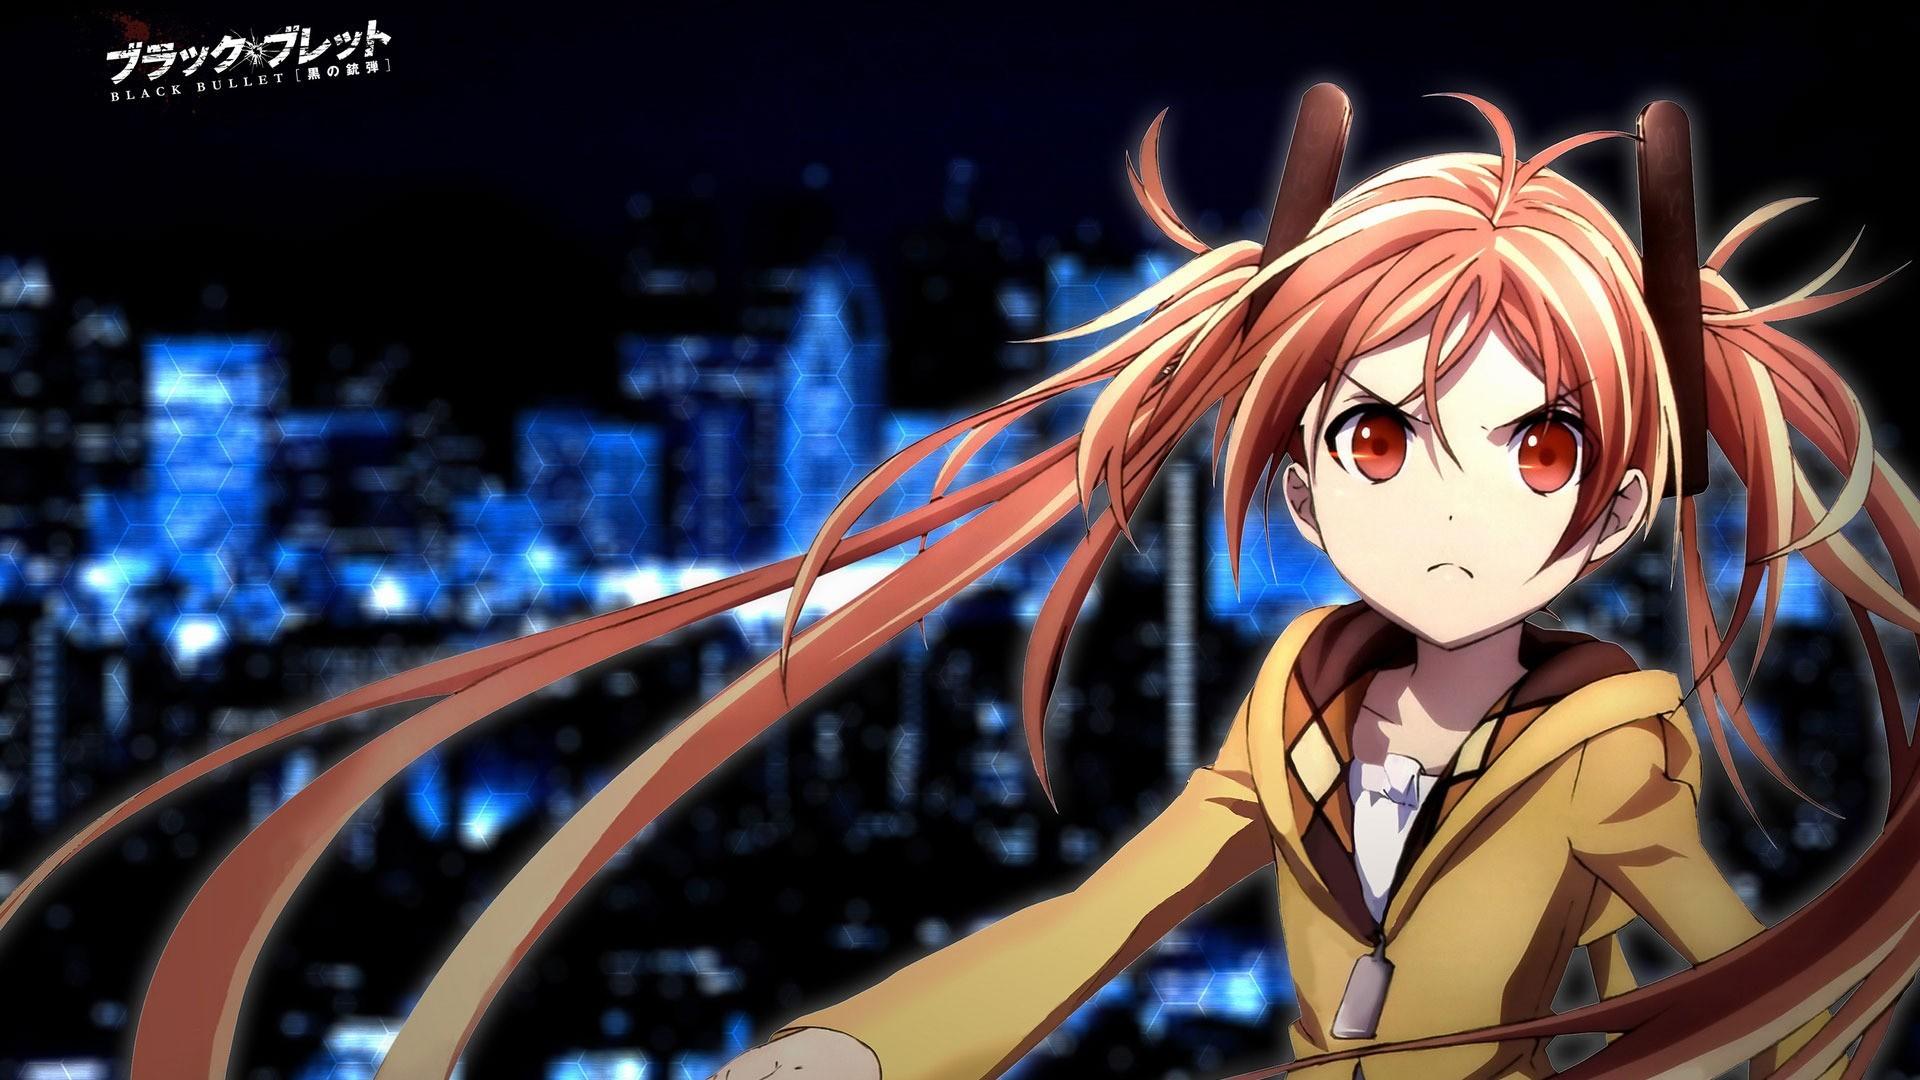 Anime Aihara Enju Black Bullet